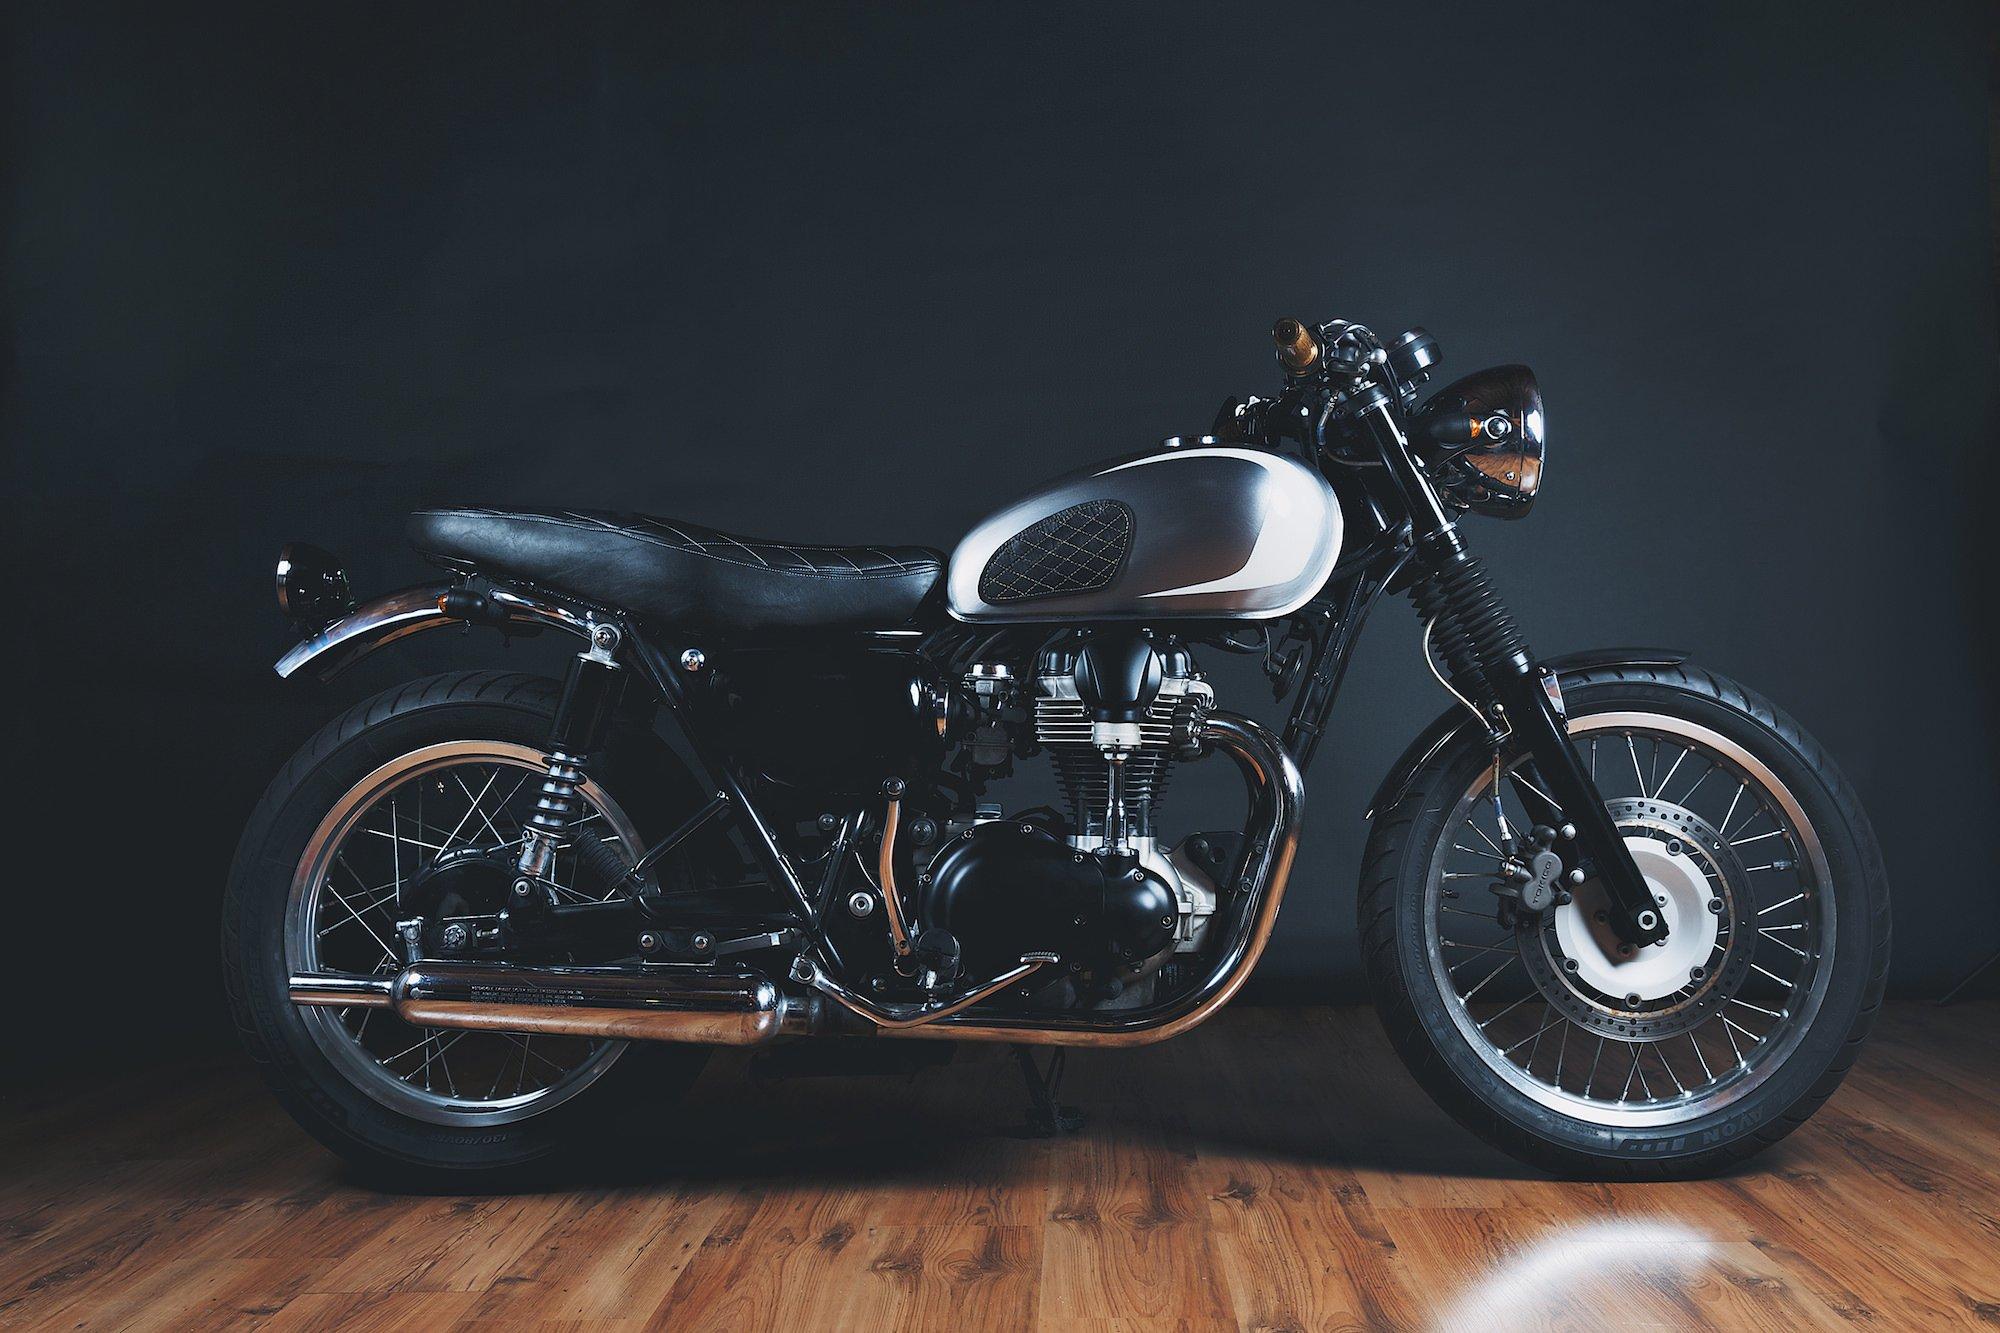 kawasaki w650 motorcycle garage motorcycles custom bikes materialicious posts motorbikes t100 bonneville mods retro tweet silodrome related